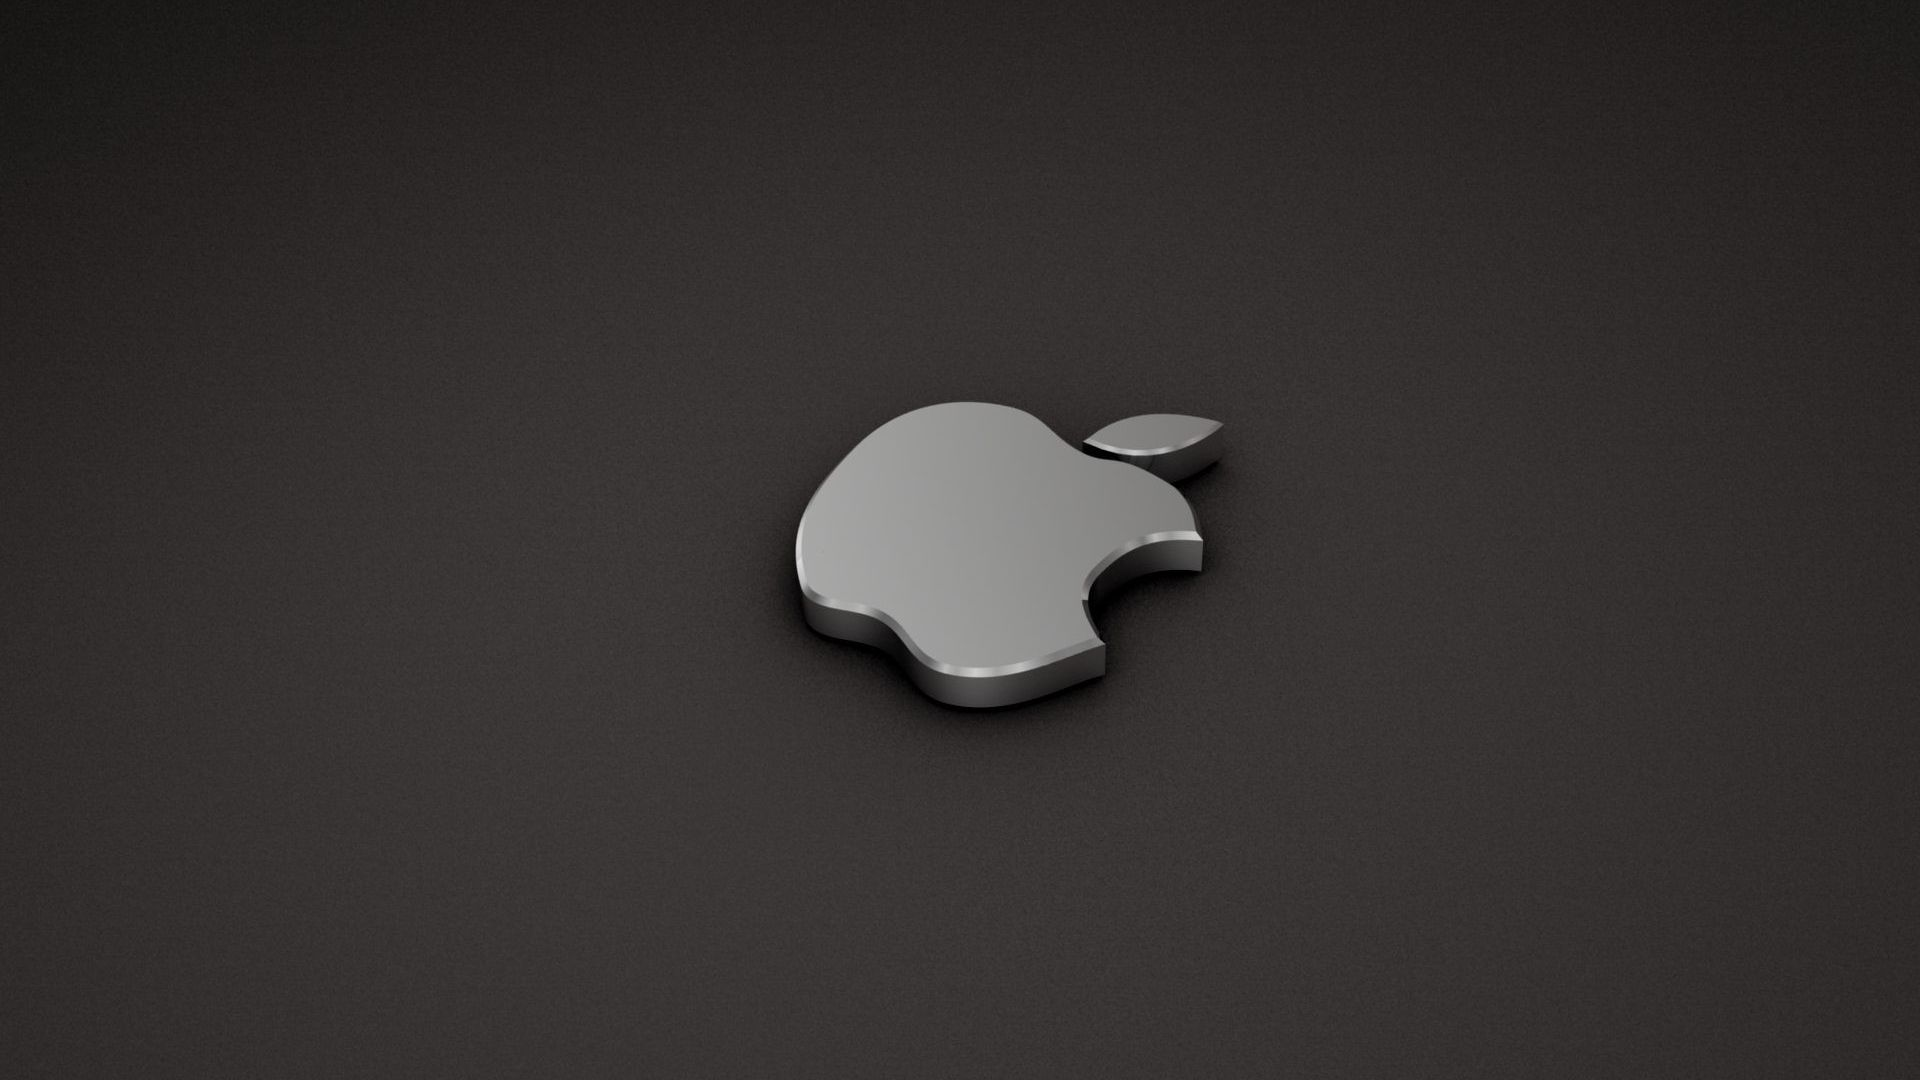 apple wallpaper hd,logo,font,graphics,metal,icon